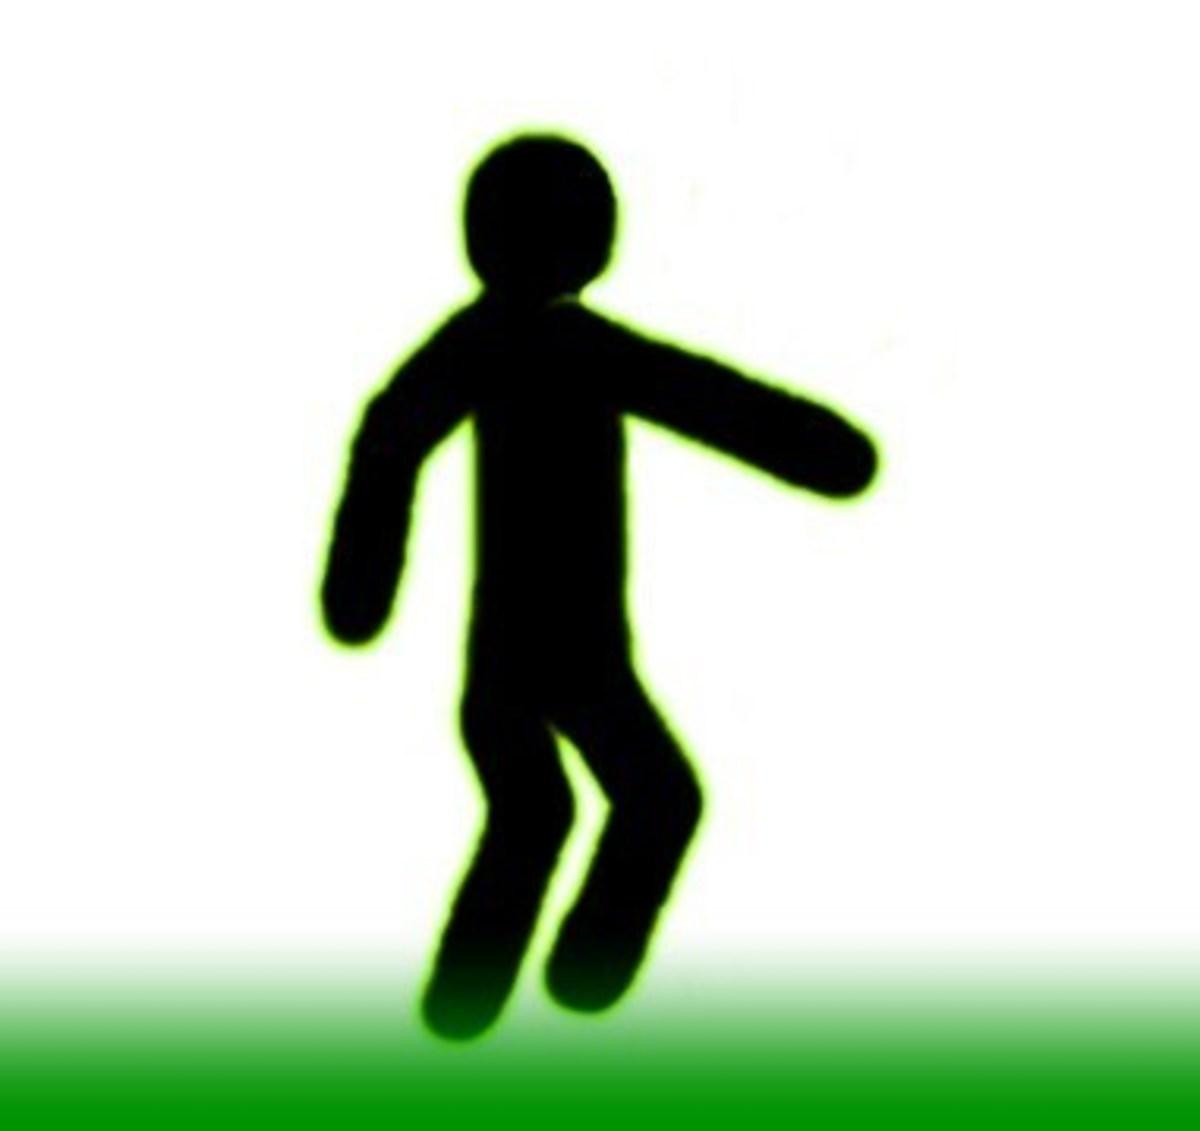 Pointing Downwards Towards Goal Area–Penalty Kick/Goal Kick